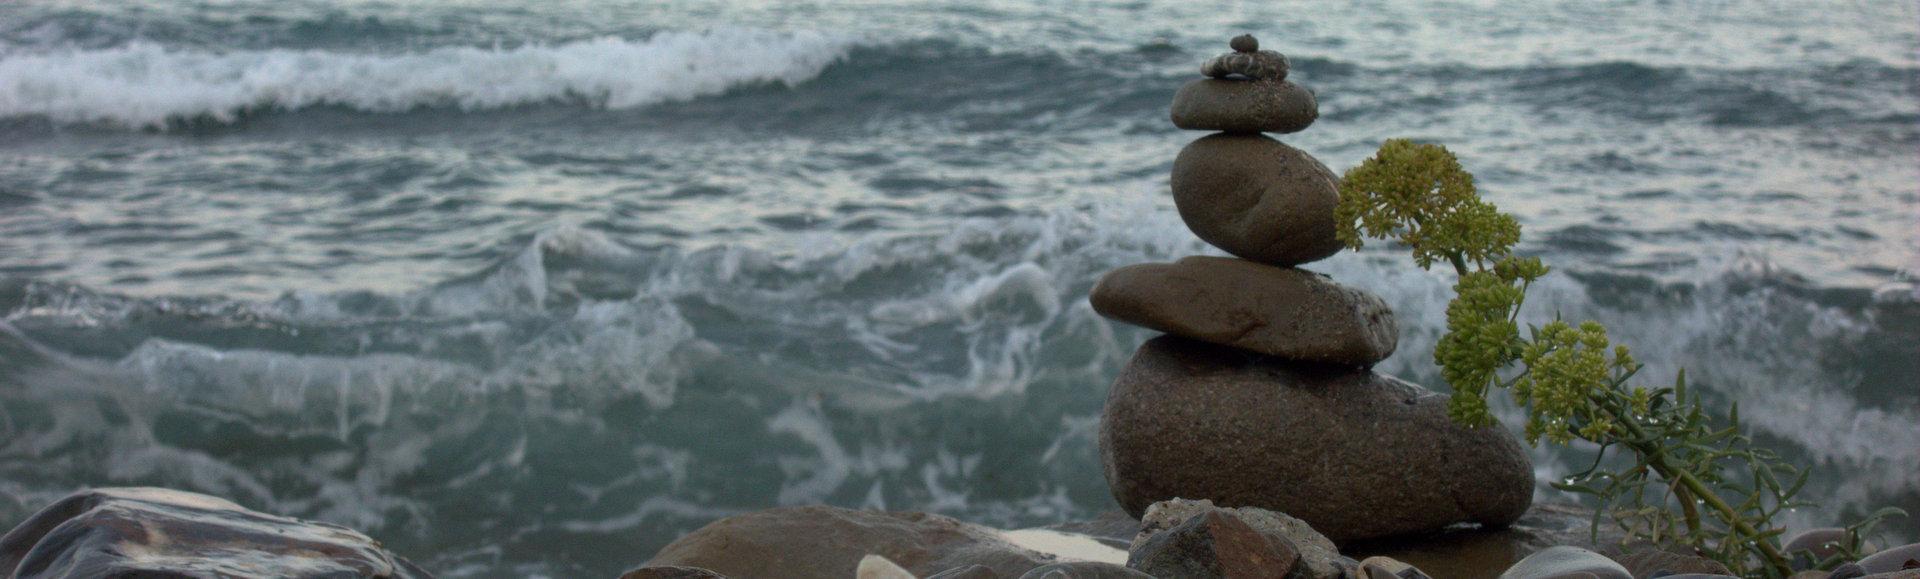 san remo playa cairns